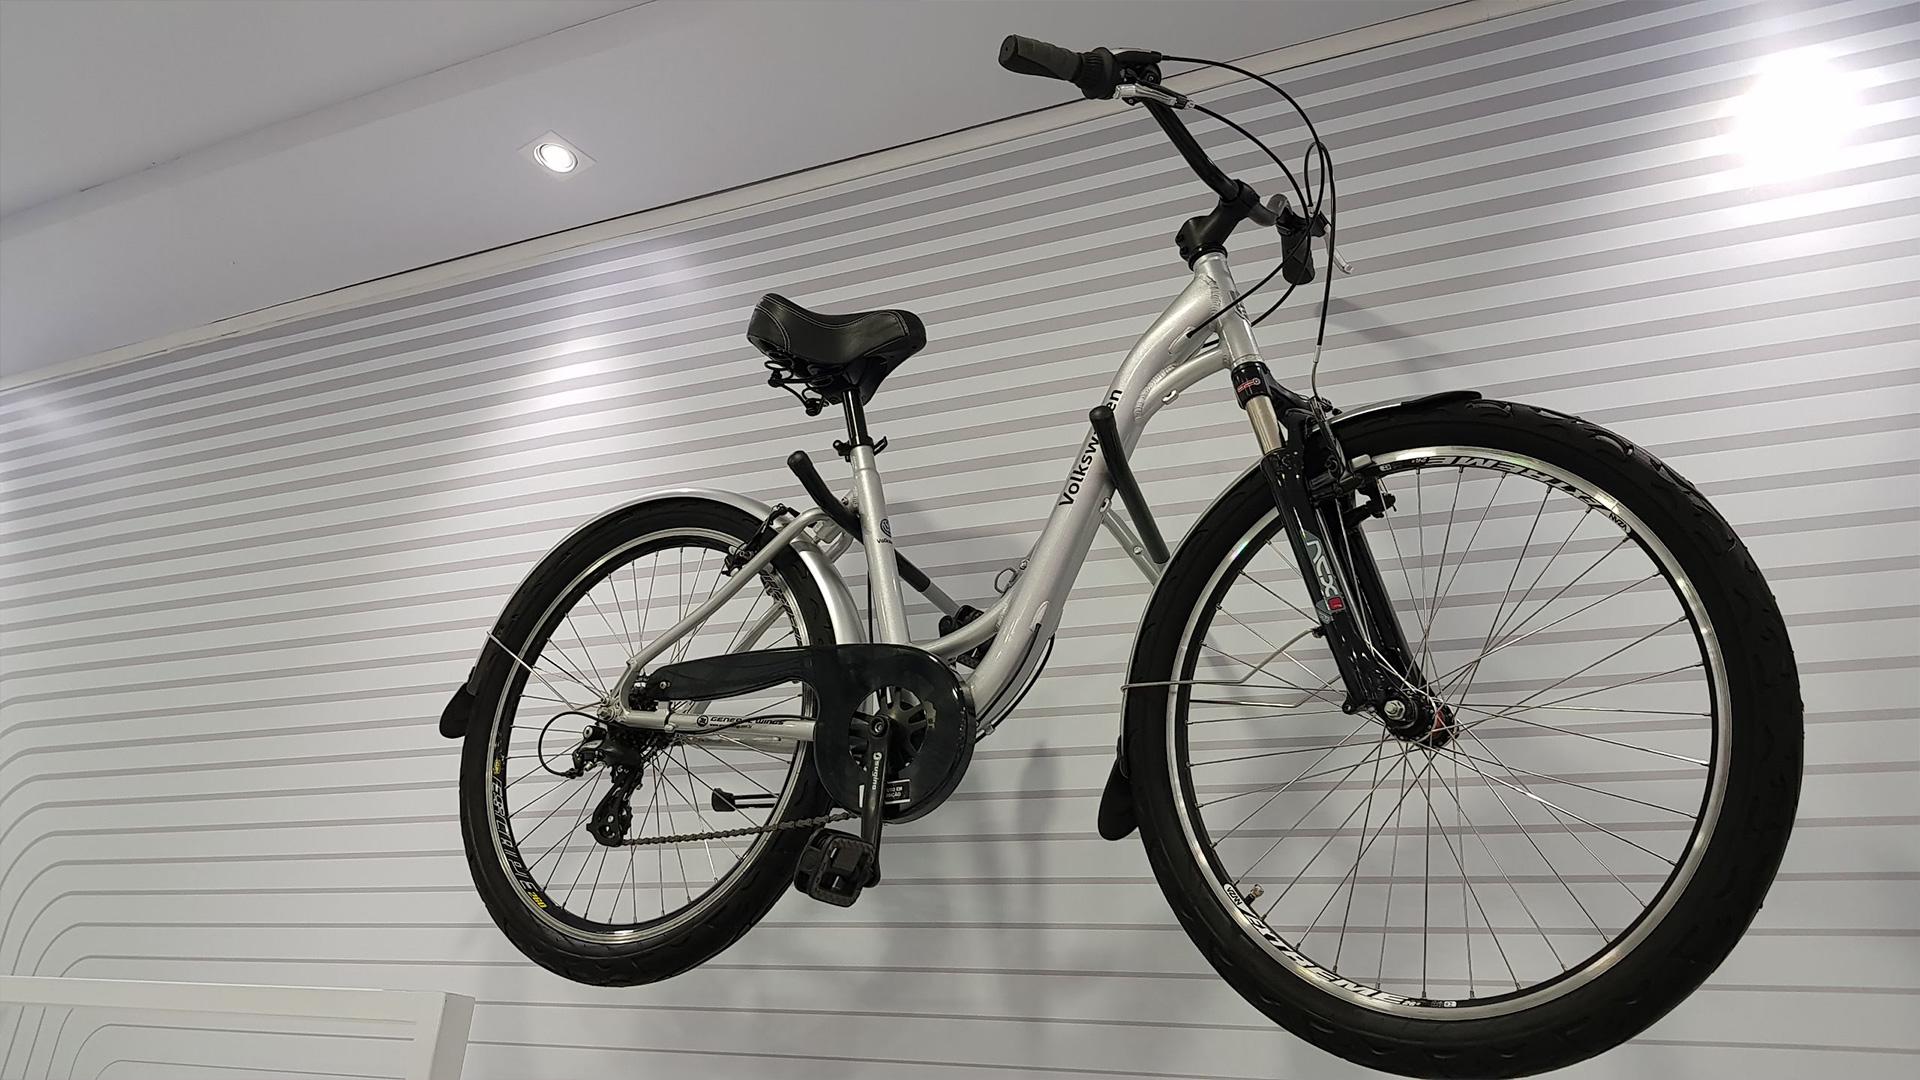 Bicicleta elétrica da Volkswagen